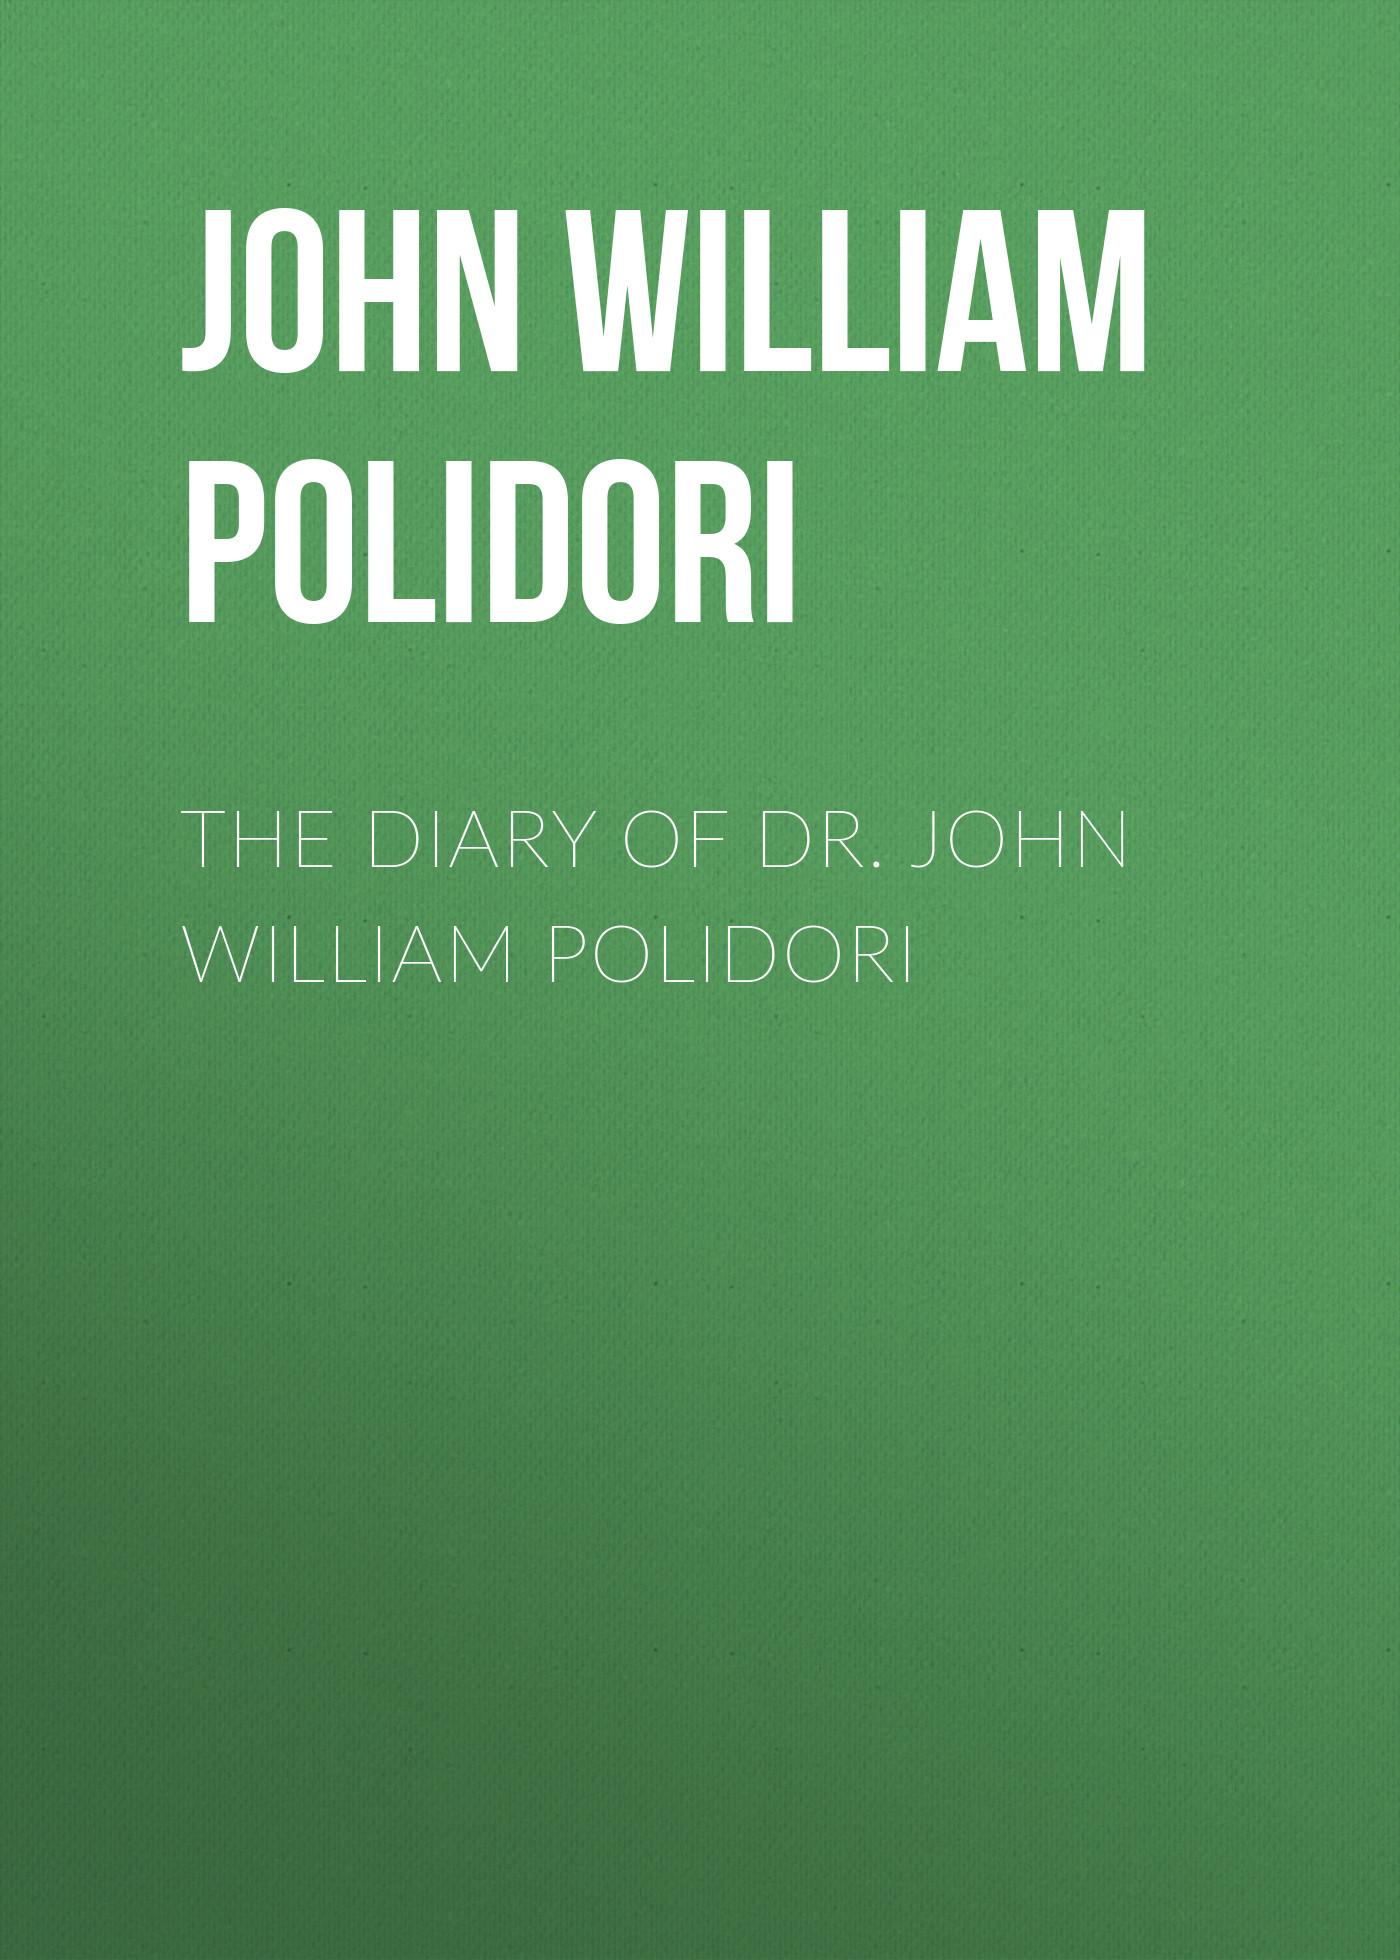 John William Polidori The Diary of Dr. John William Polidori